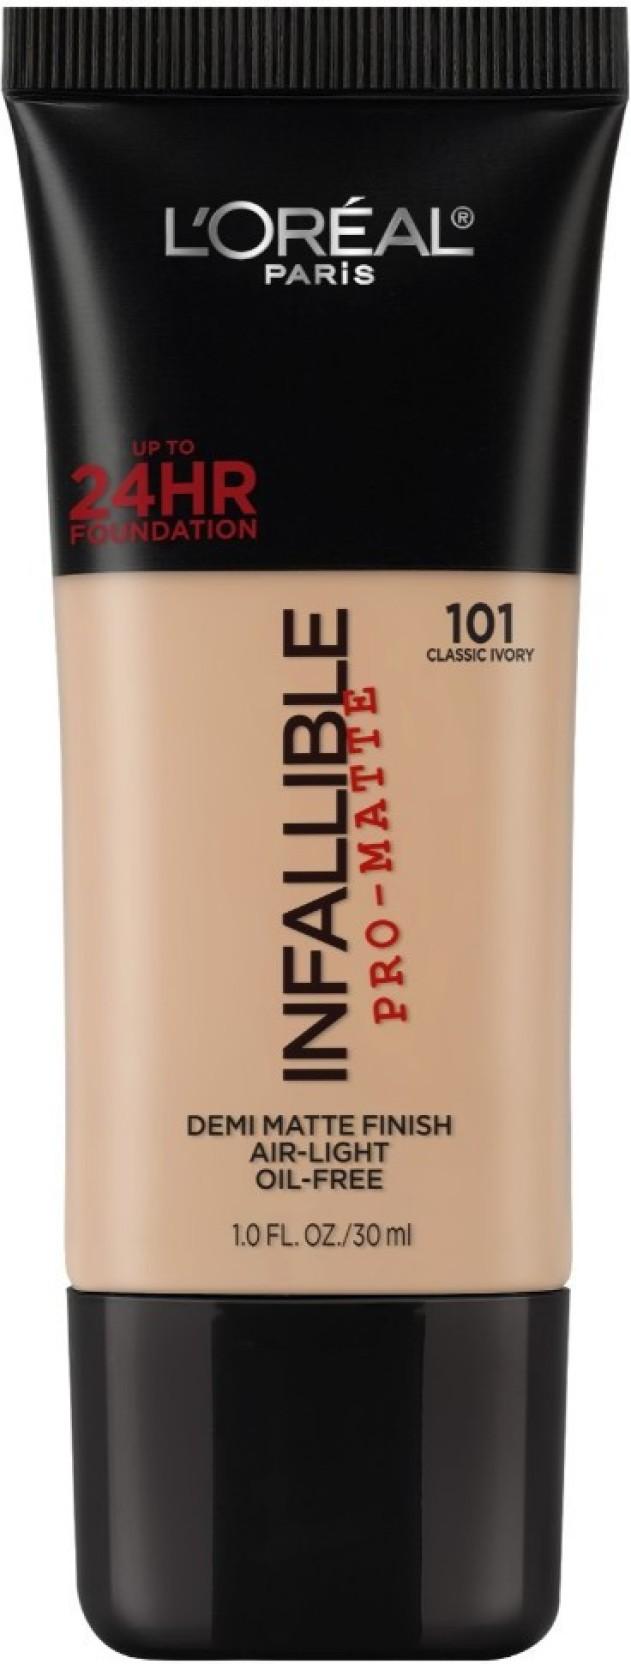 L'Oreal Paris Infallible Pro-matte Foundation. ADD TO CART